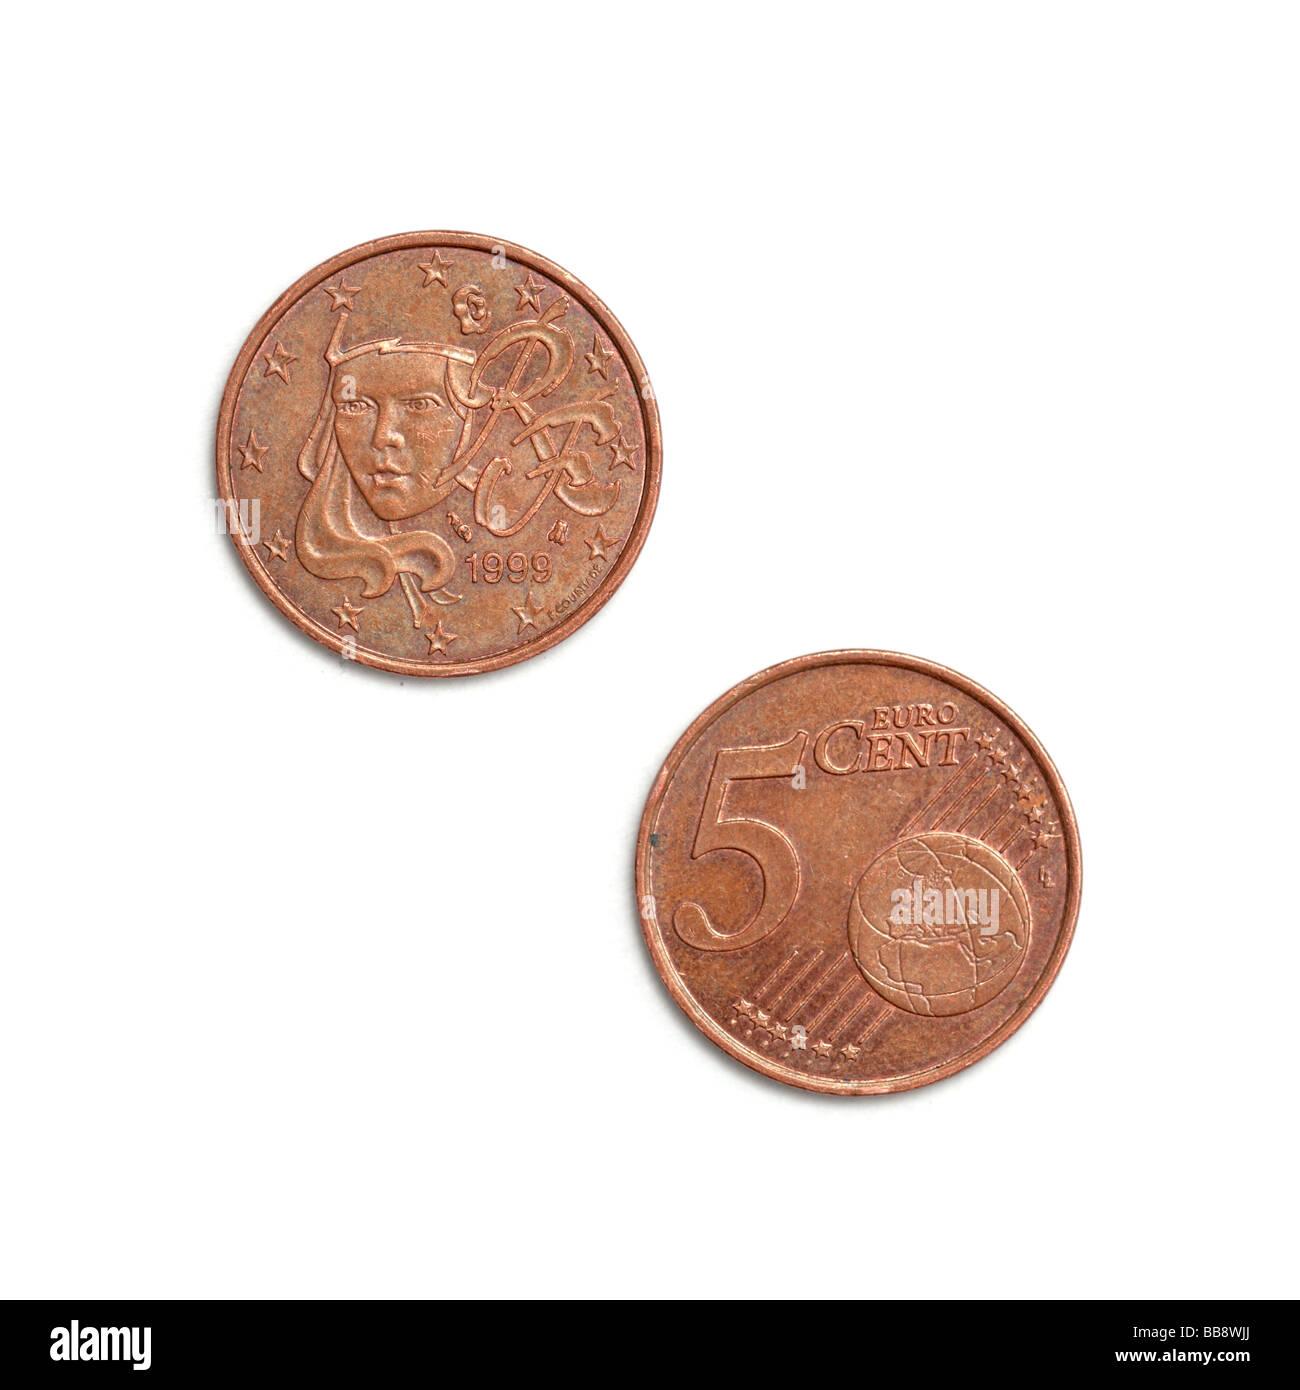 5 Cent Coins Stockfotos 5 Cent Coins Bilder Seite 3 Alamy